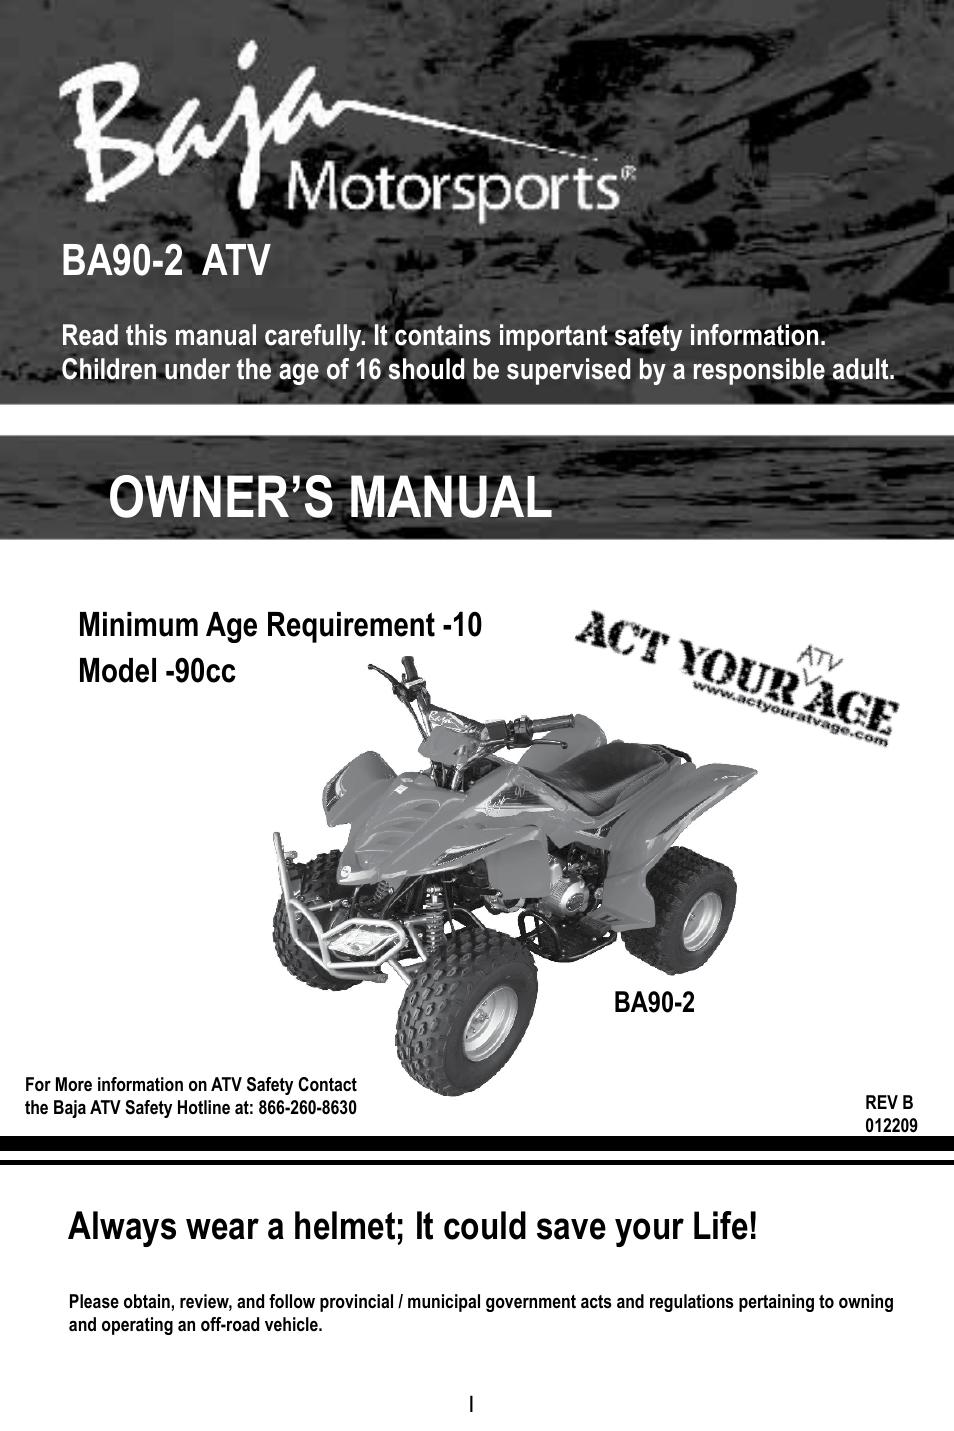 medium resolution of  wiring diagram database on baja motorsports atv siteandsites co on